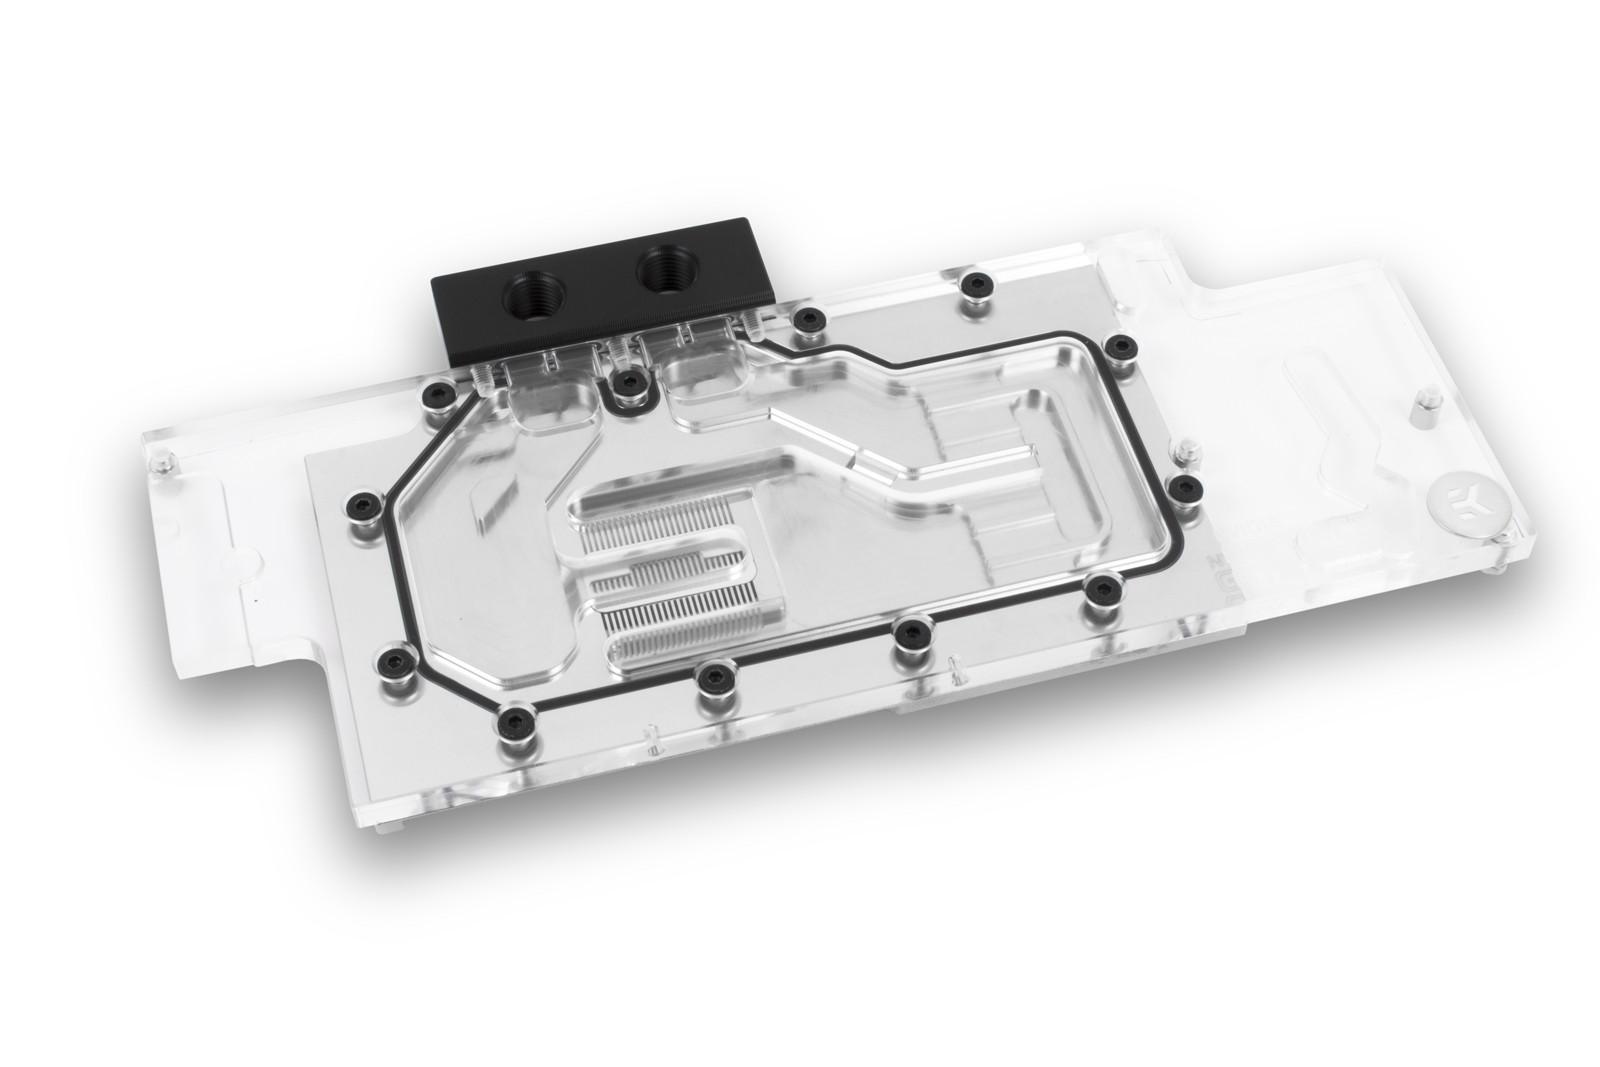 EKWB: TITAN X Pascal waterblocks compatible with GeForce GTX